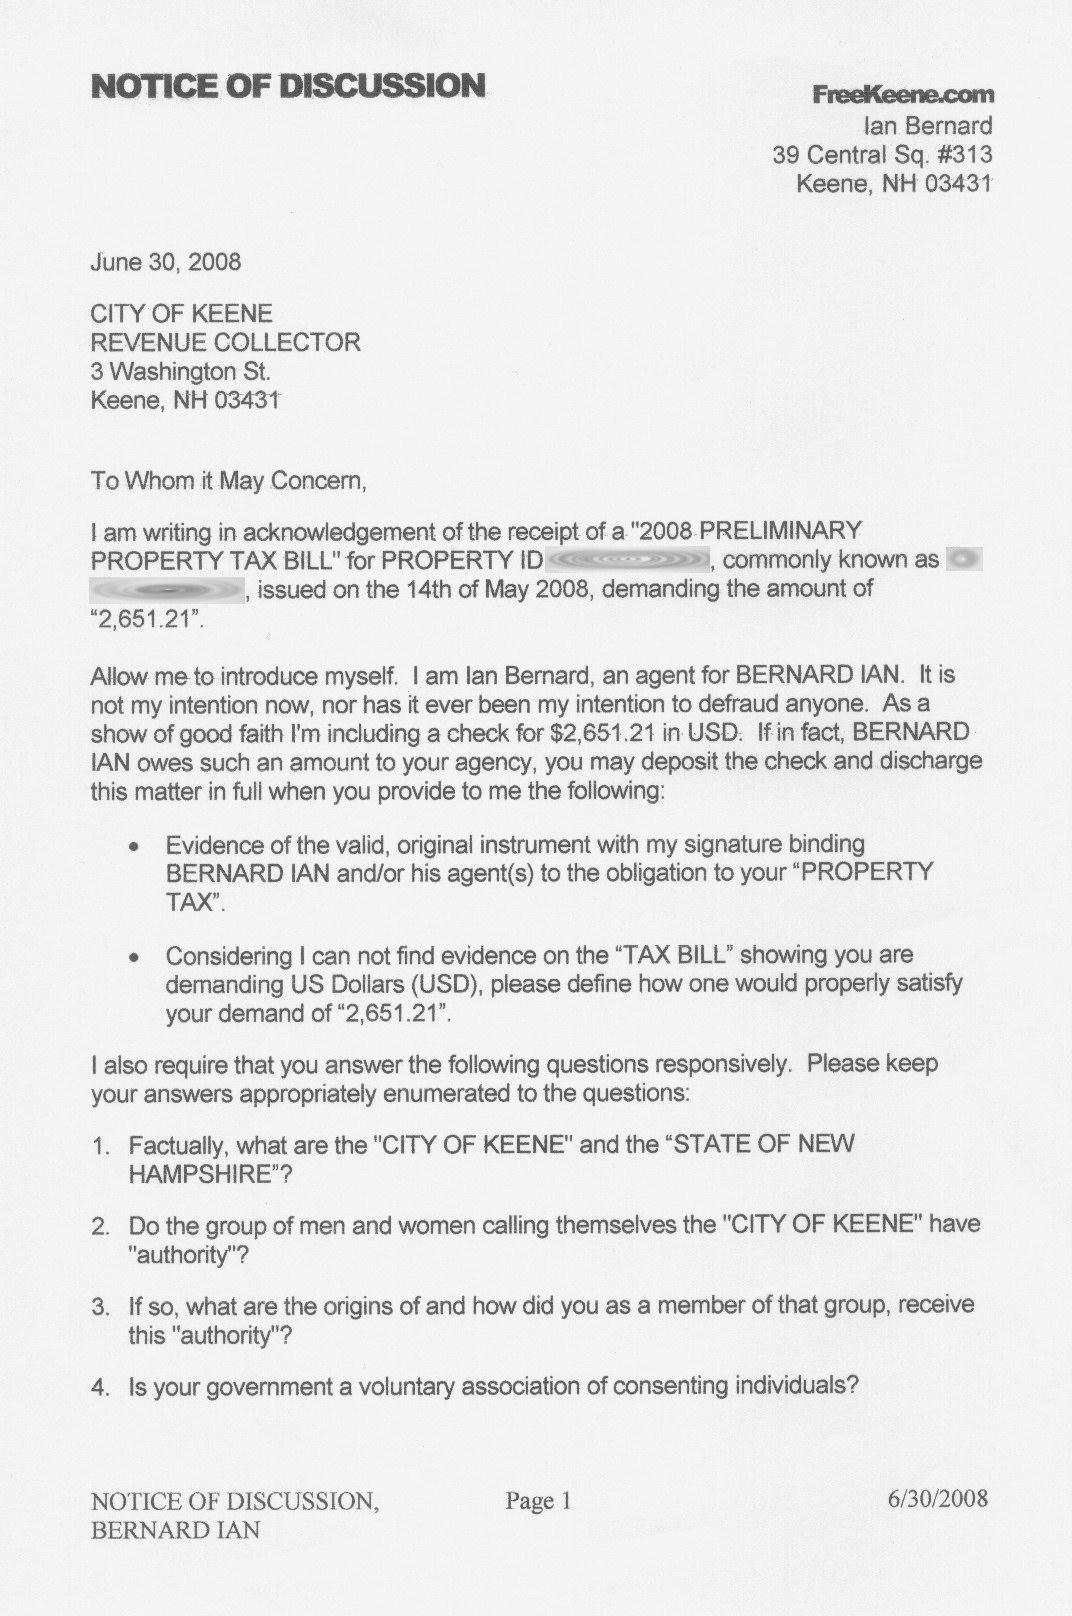 legal letter giving permission resume and cover letter examples legal letter giving permission legal letters sample legal cover letters us legal forms fullcustodyagreementletters child custody